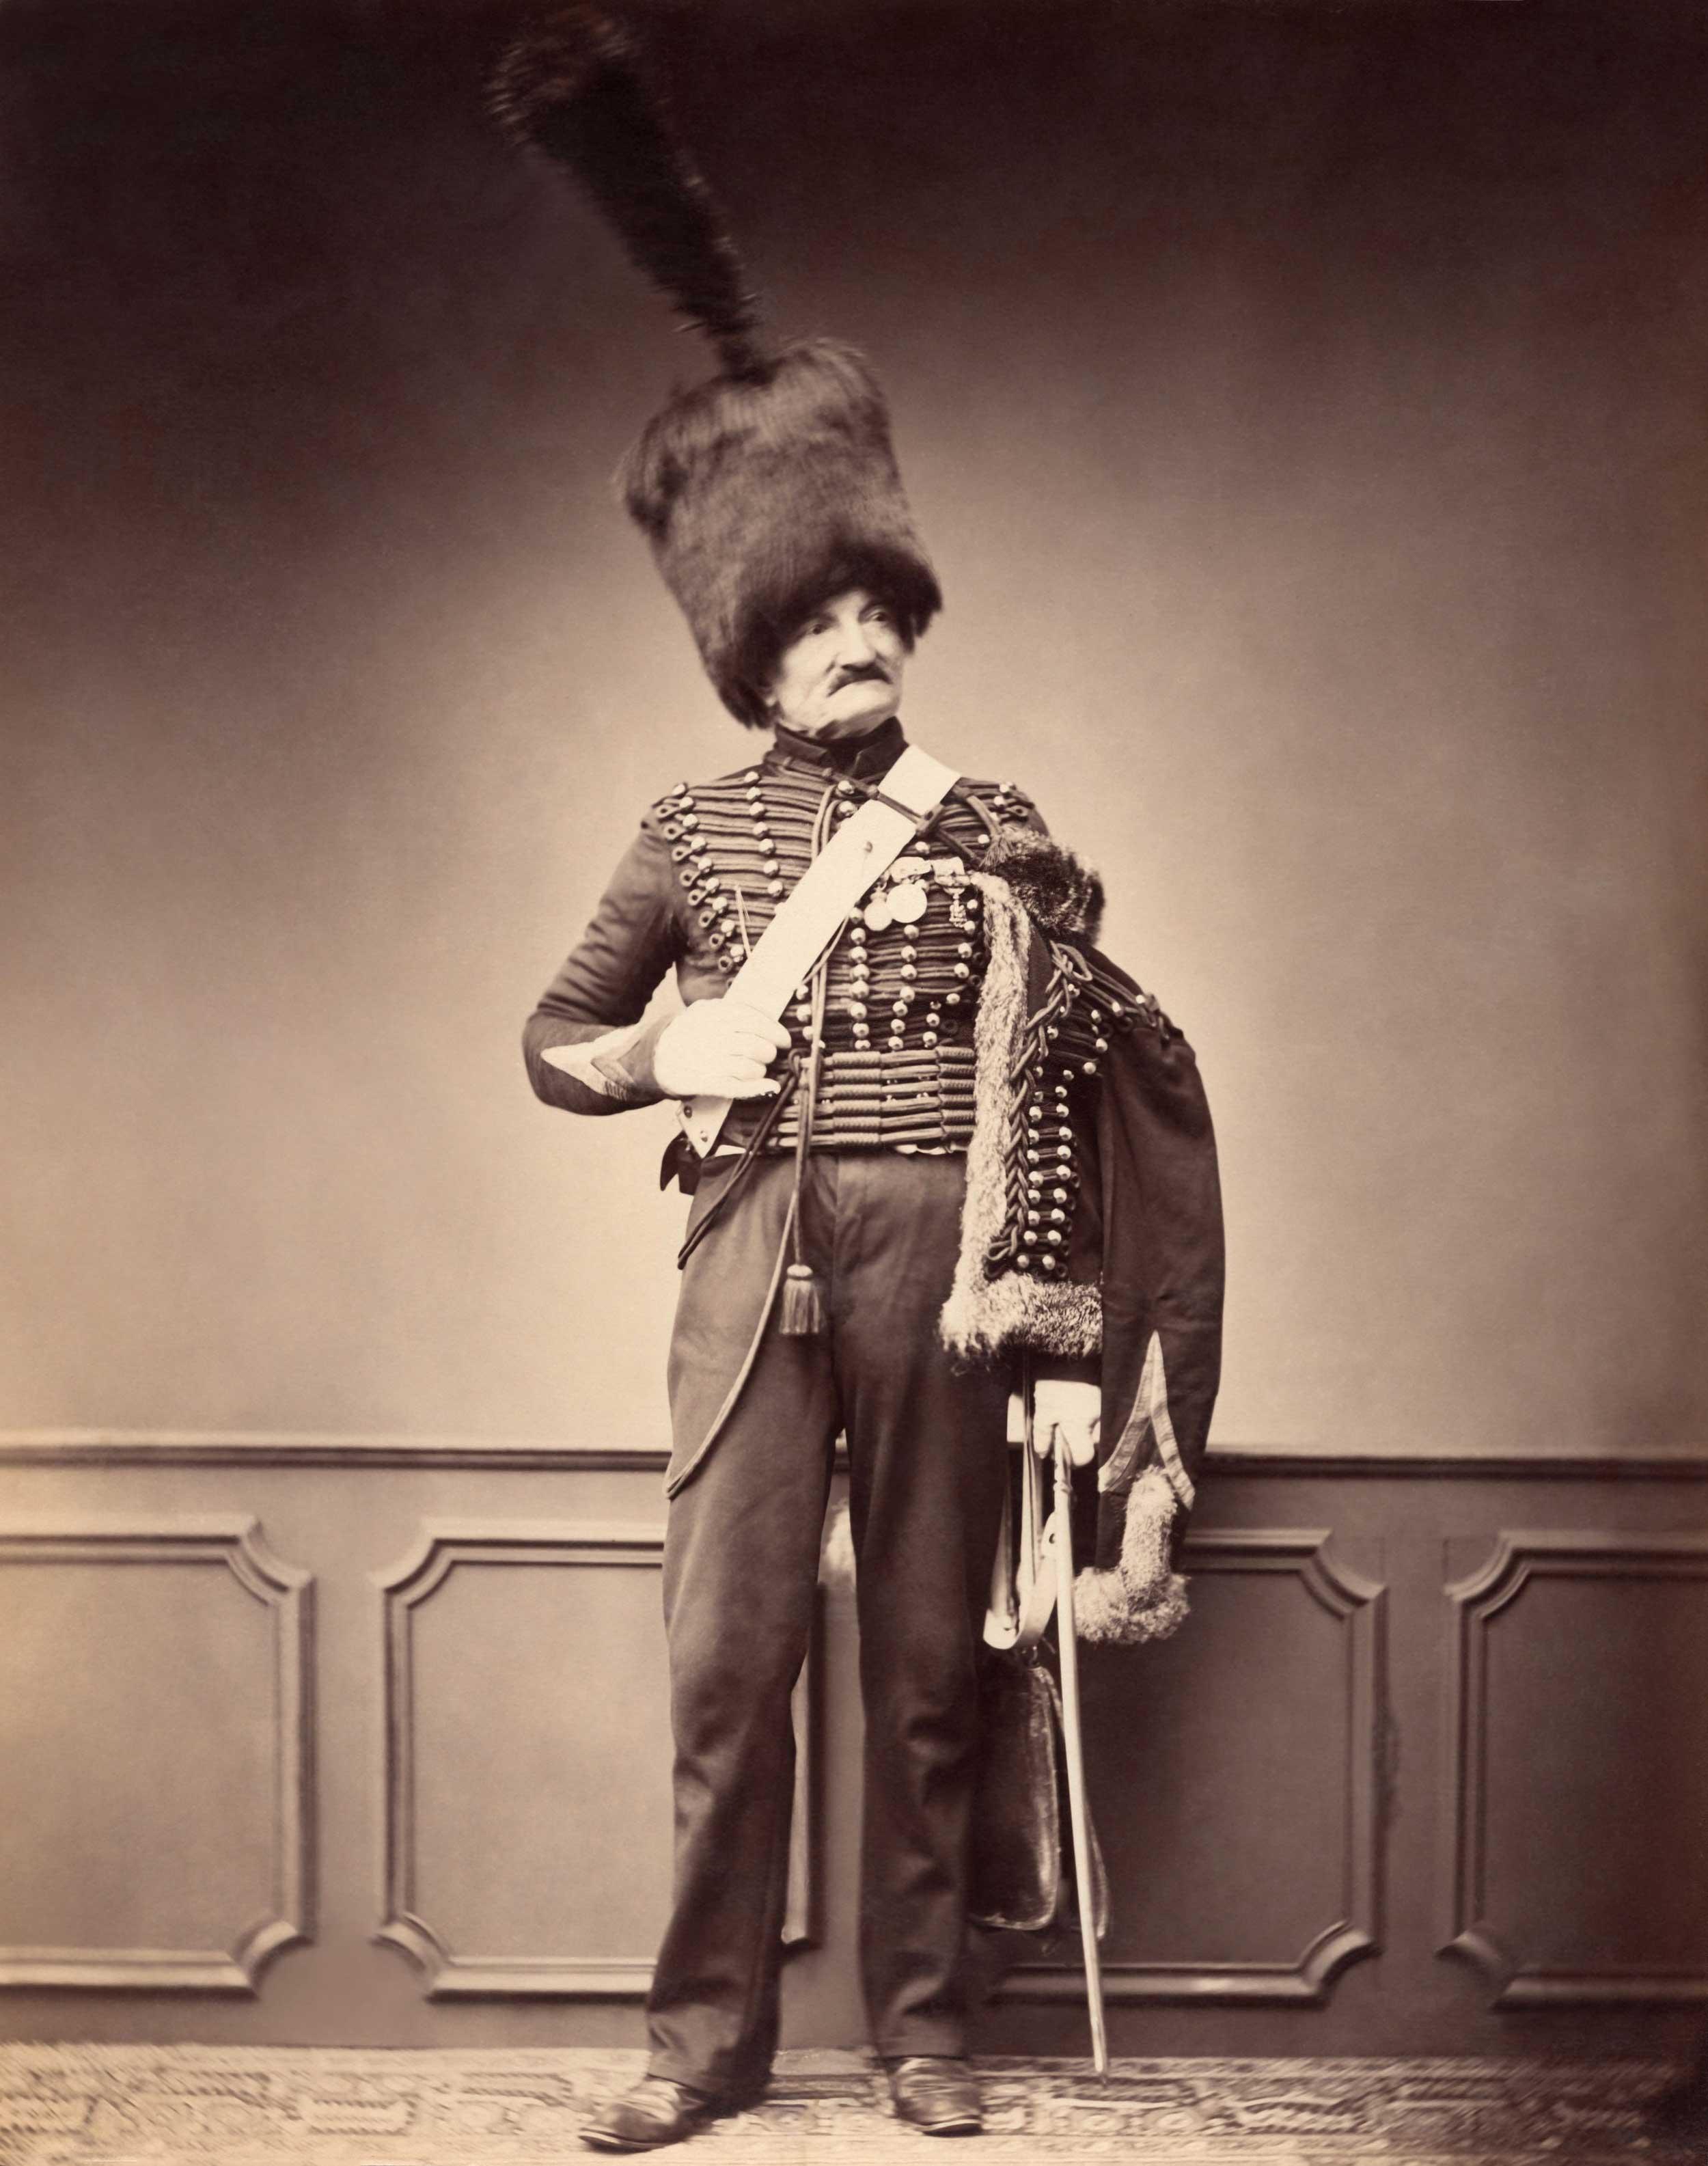 Monsieur Maire, 7th Hussars, c. 1809-15